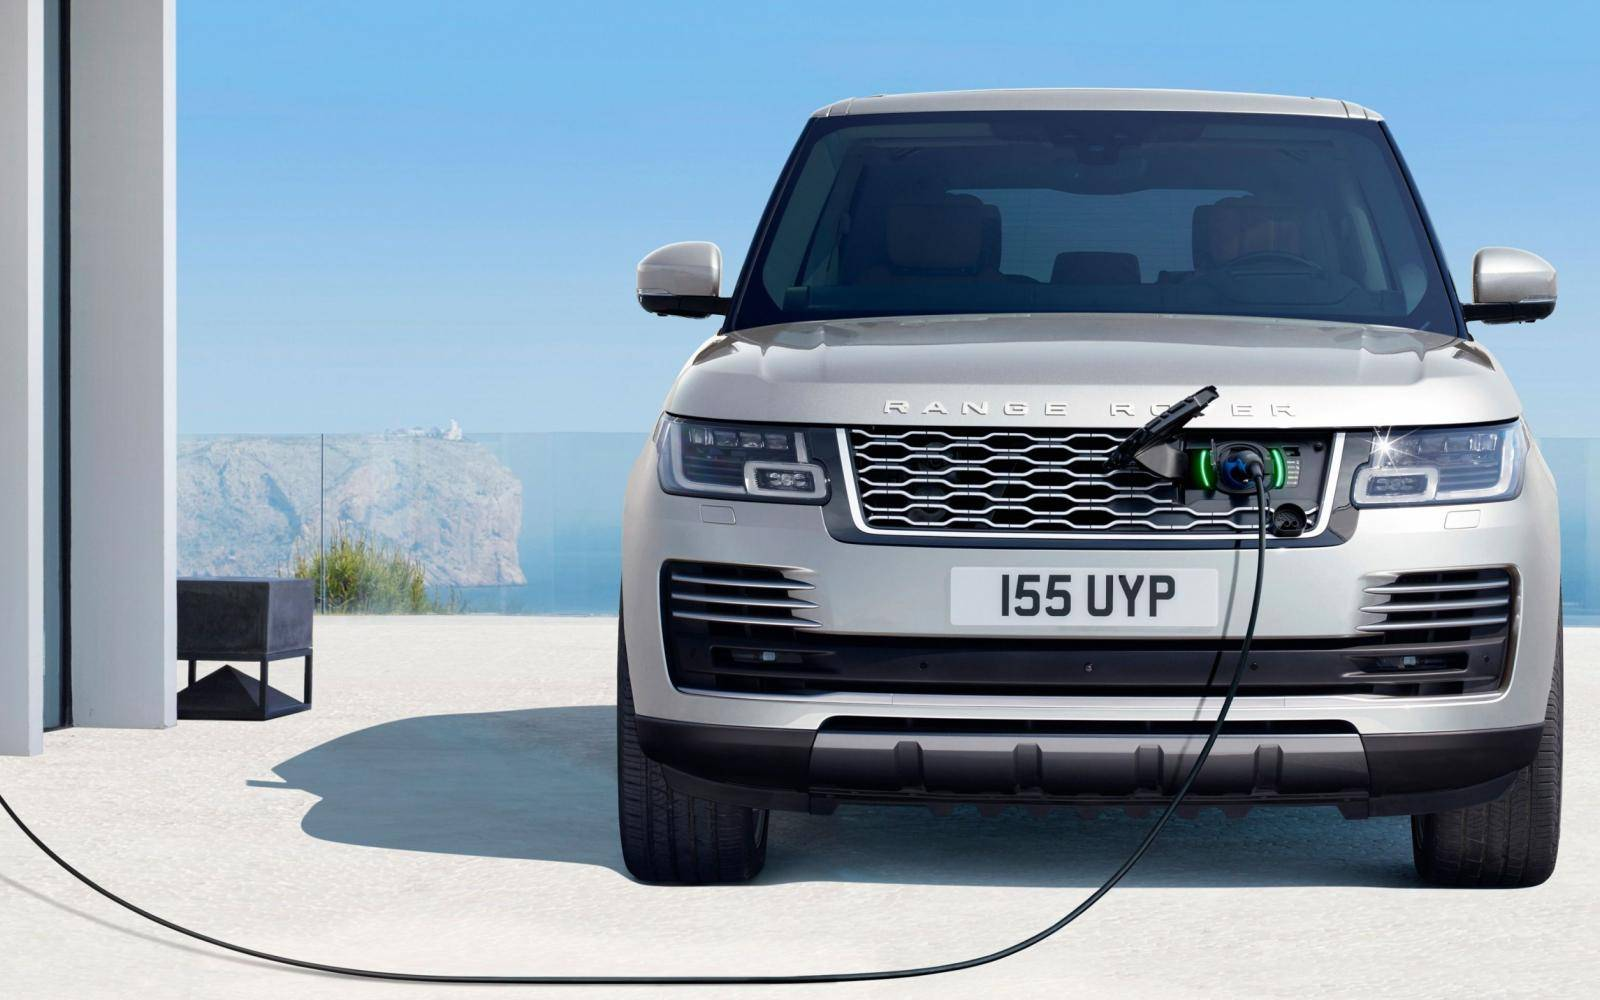 Land Rover lanceert binnenkort elektrische Range Rover